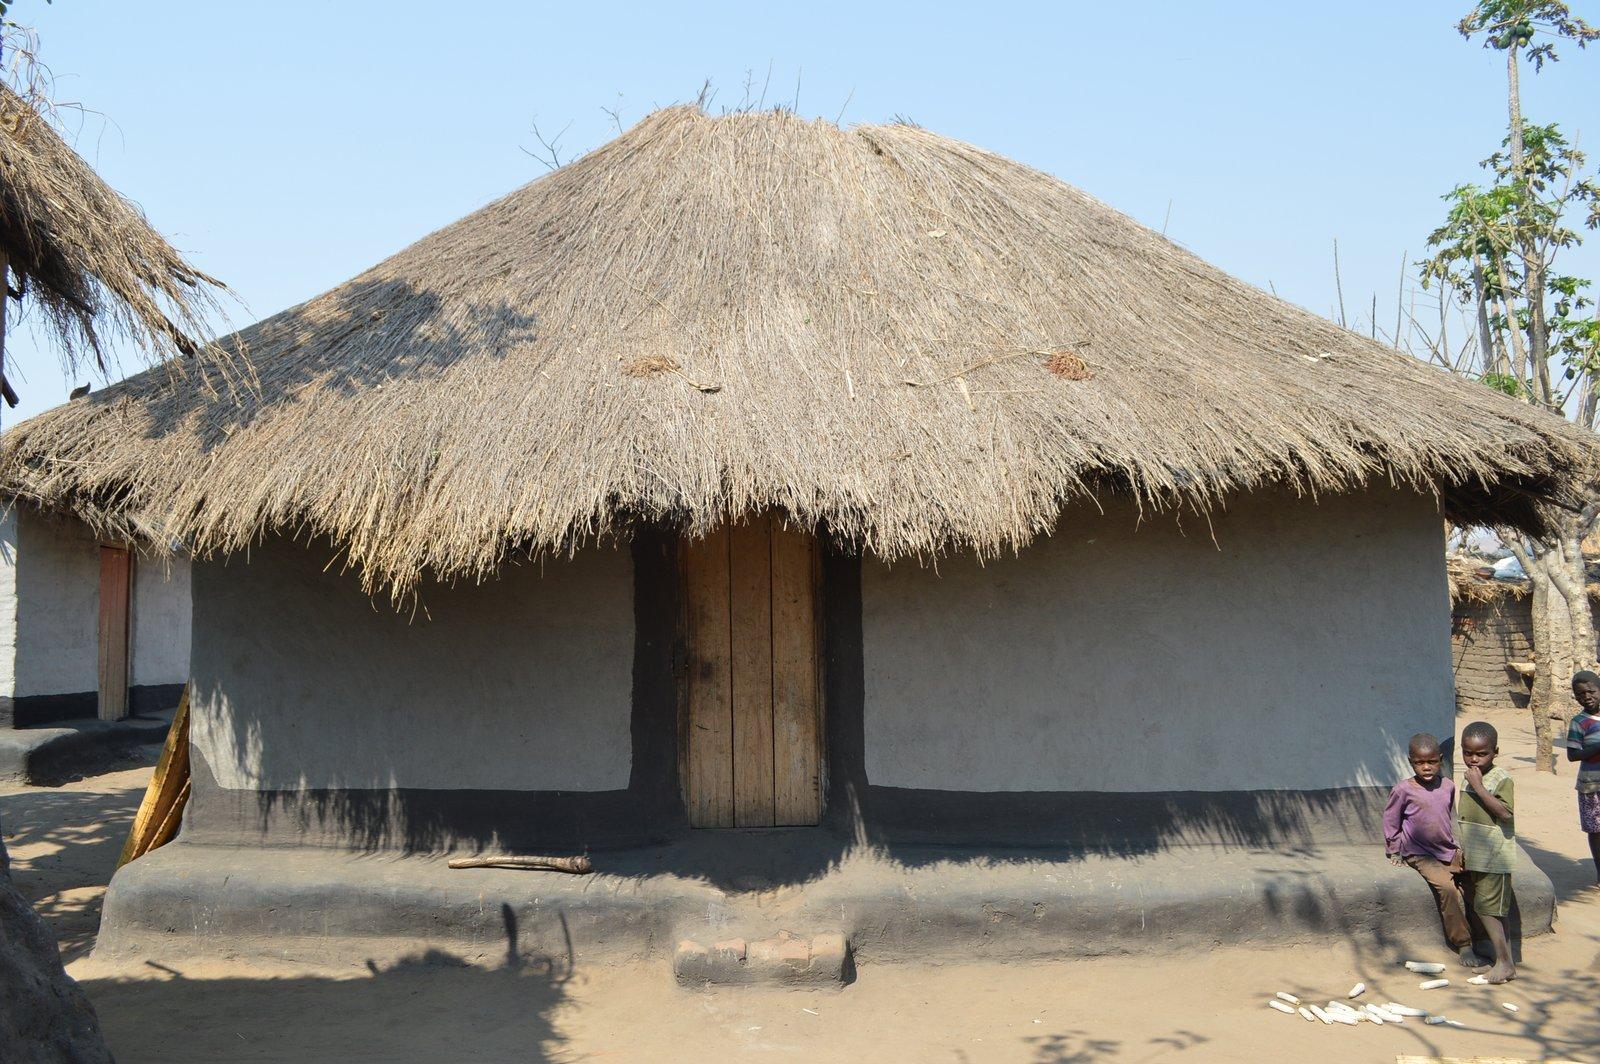 Malawi Vernacular Architecture (10)